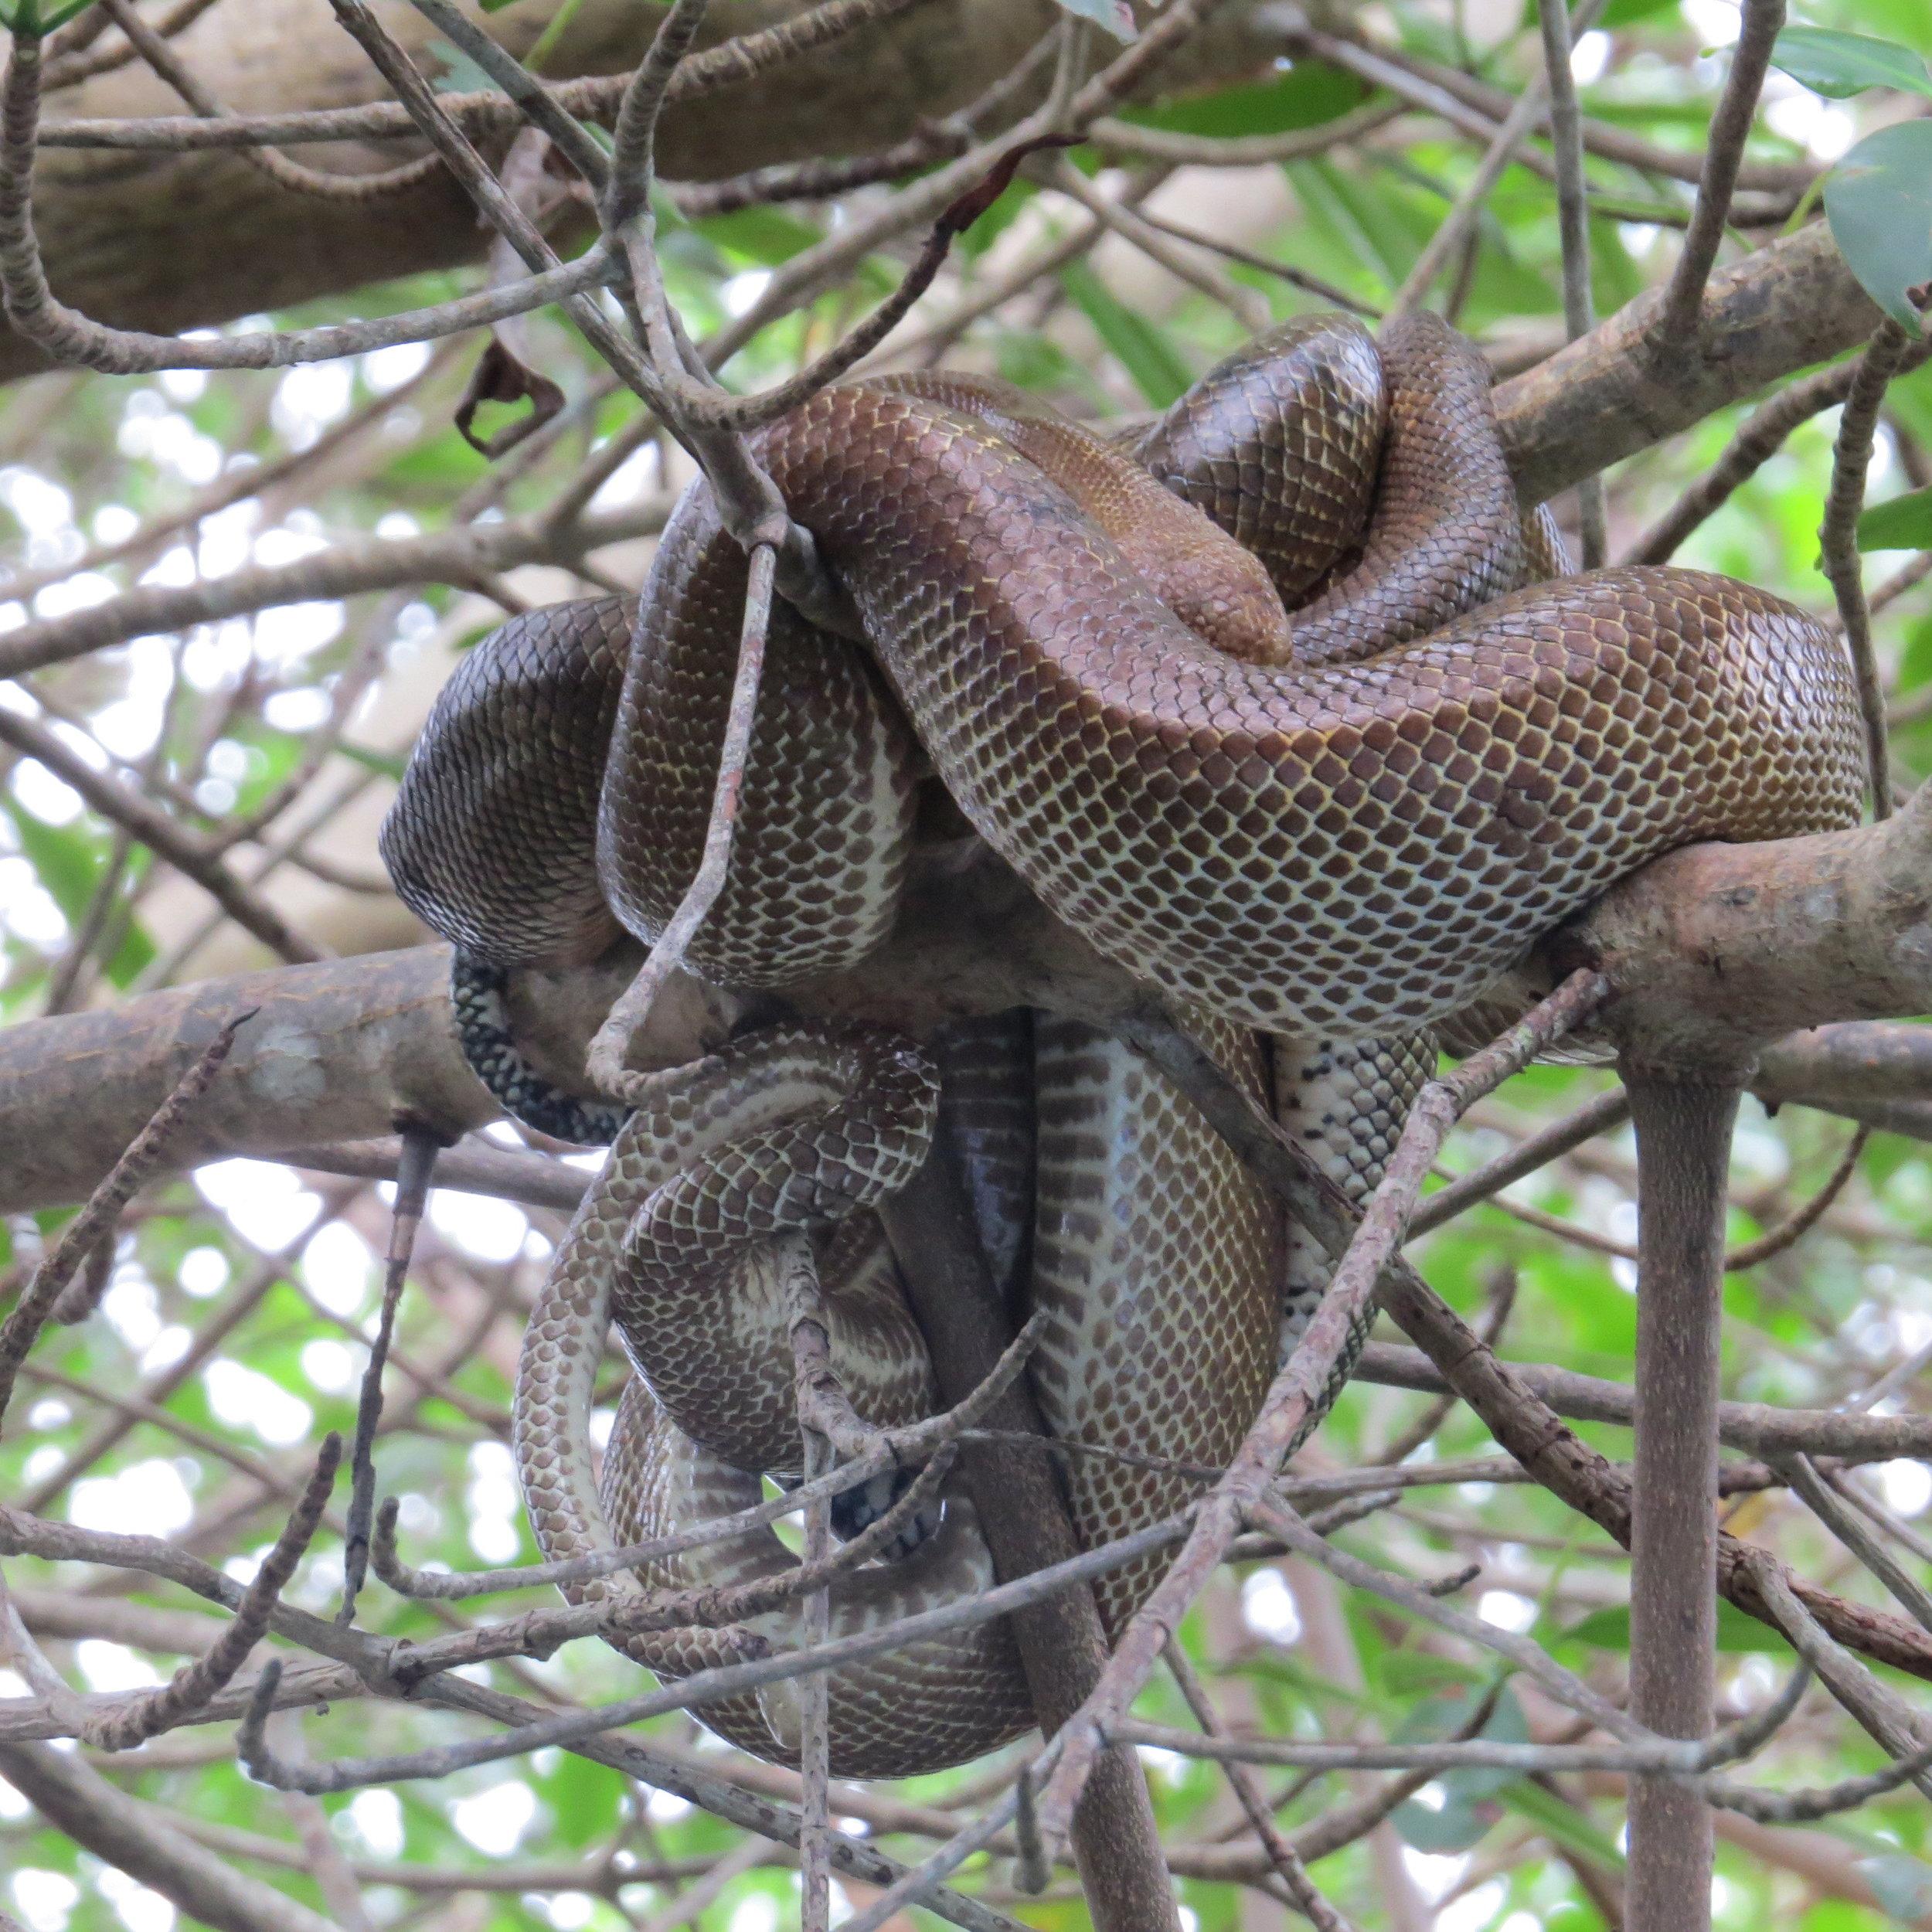 Tree boas in the Caroni Swamp